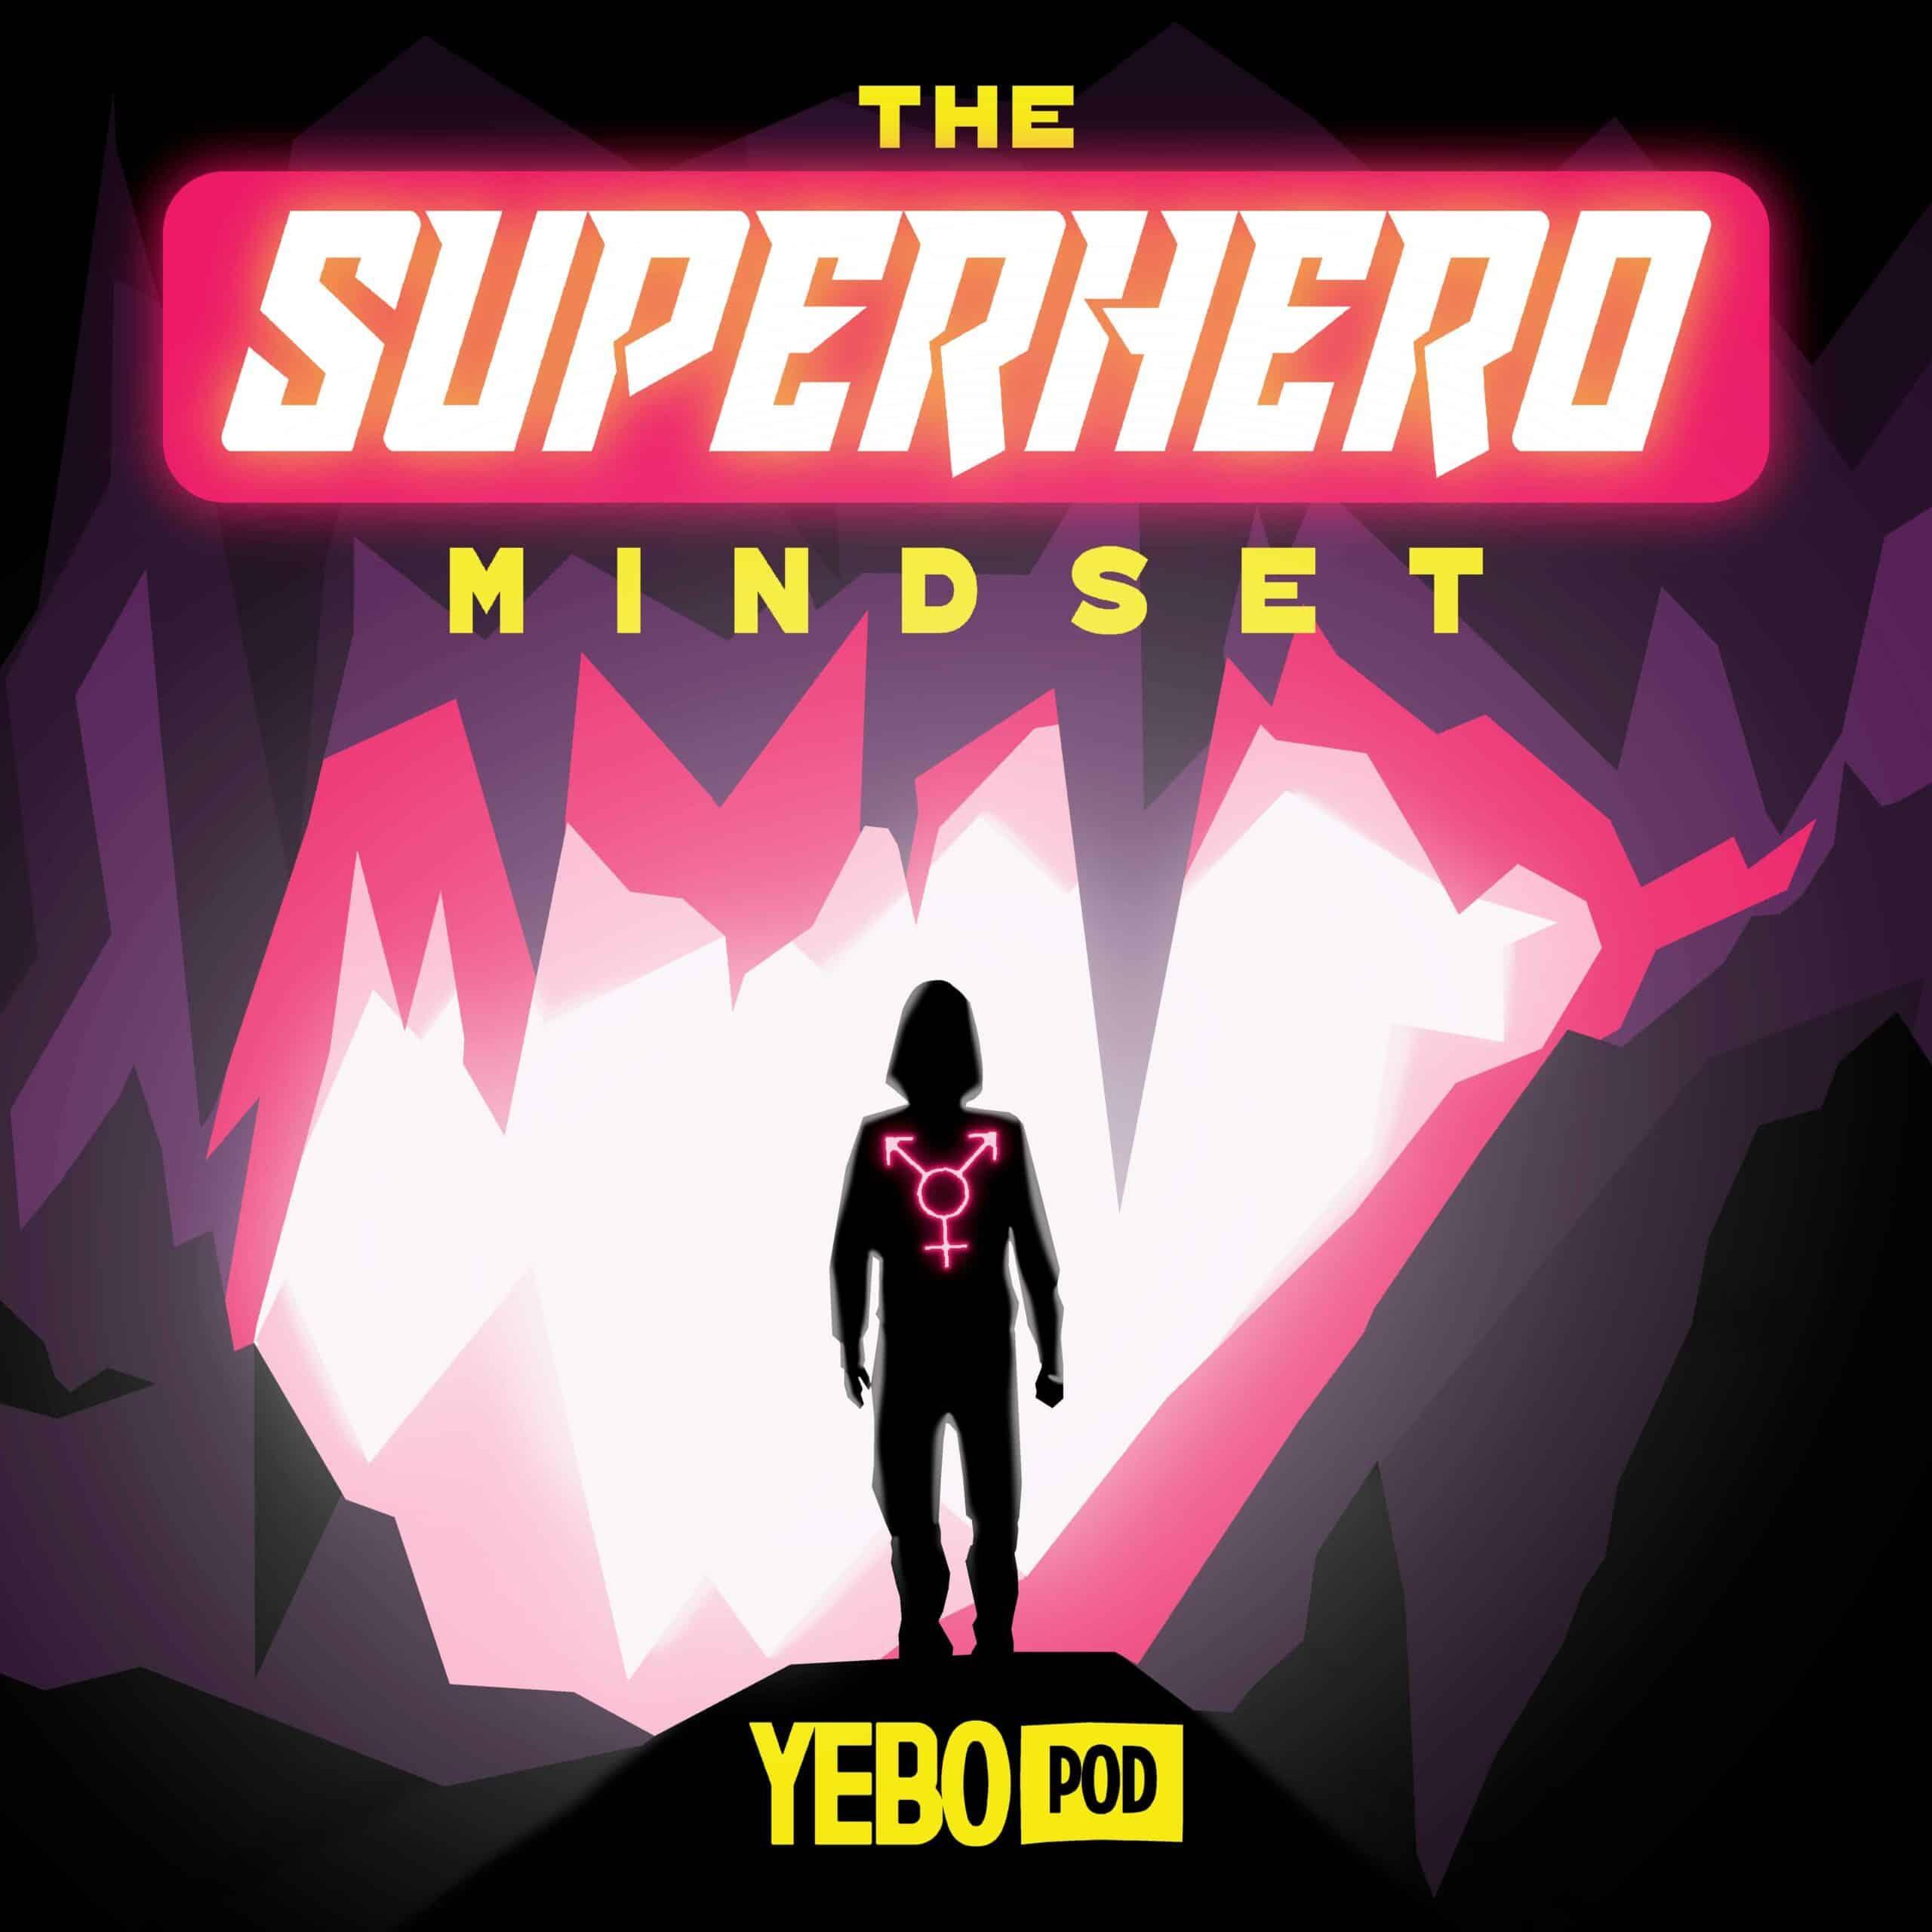 Superhero Mindset Podcast Cover